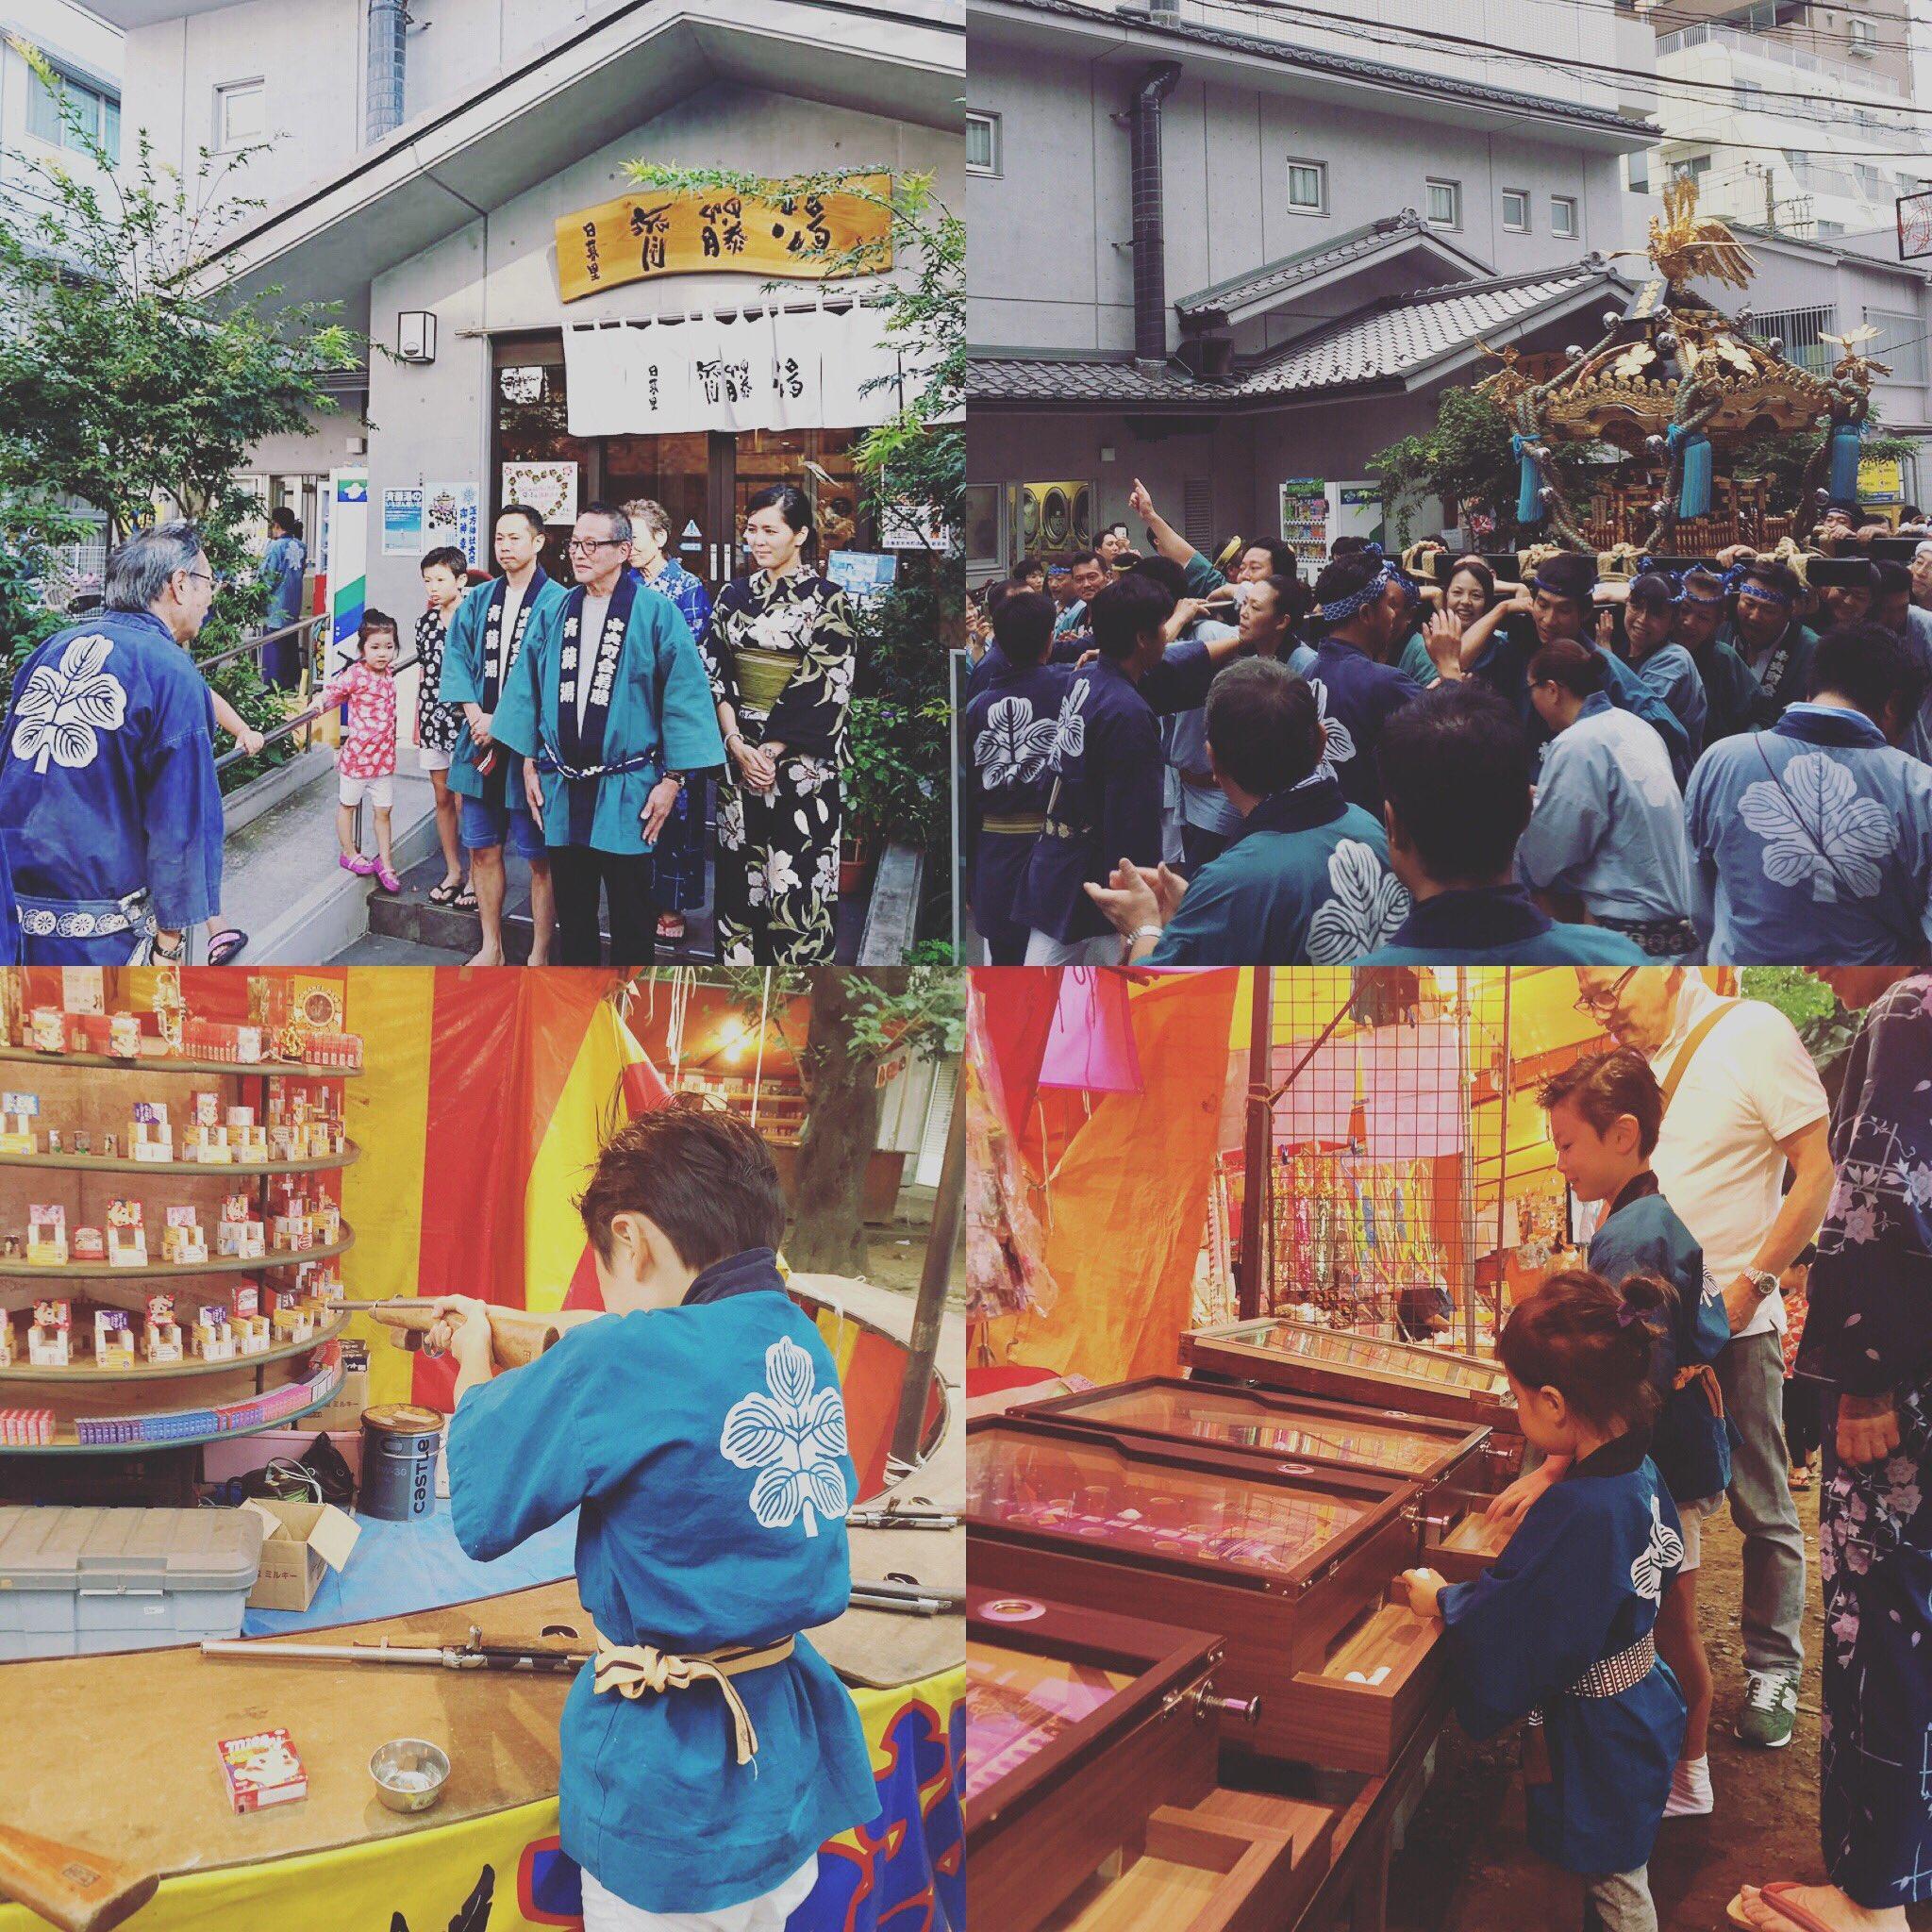 http://www.saito-yu.com/information/DlCwp2UVsAMwtha.jpg